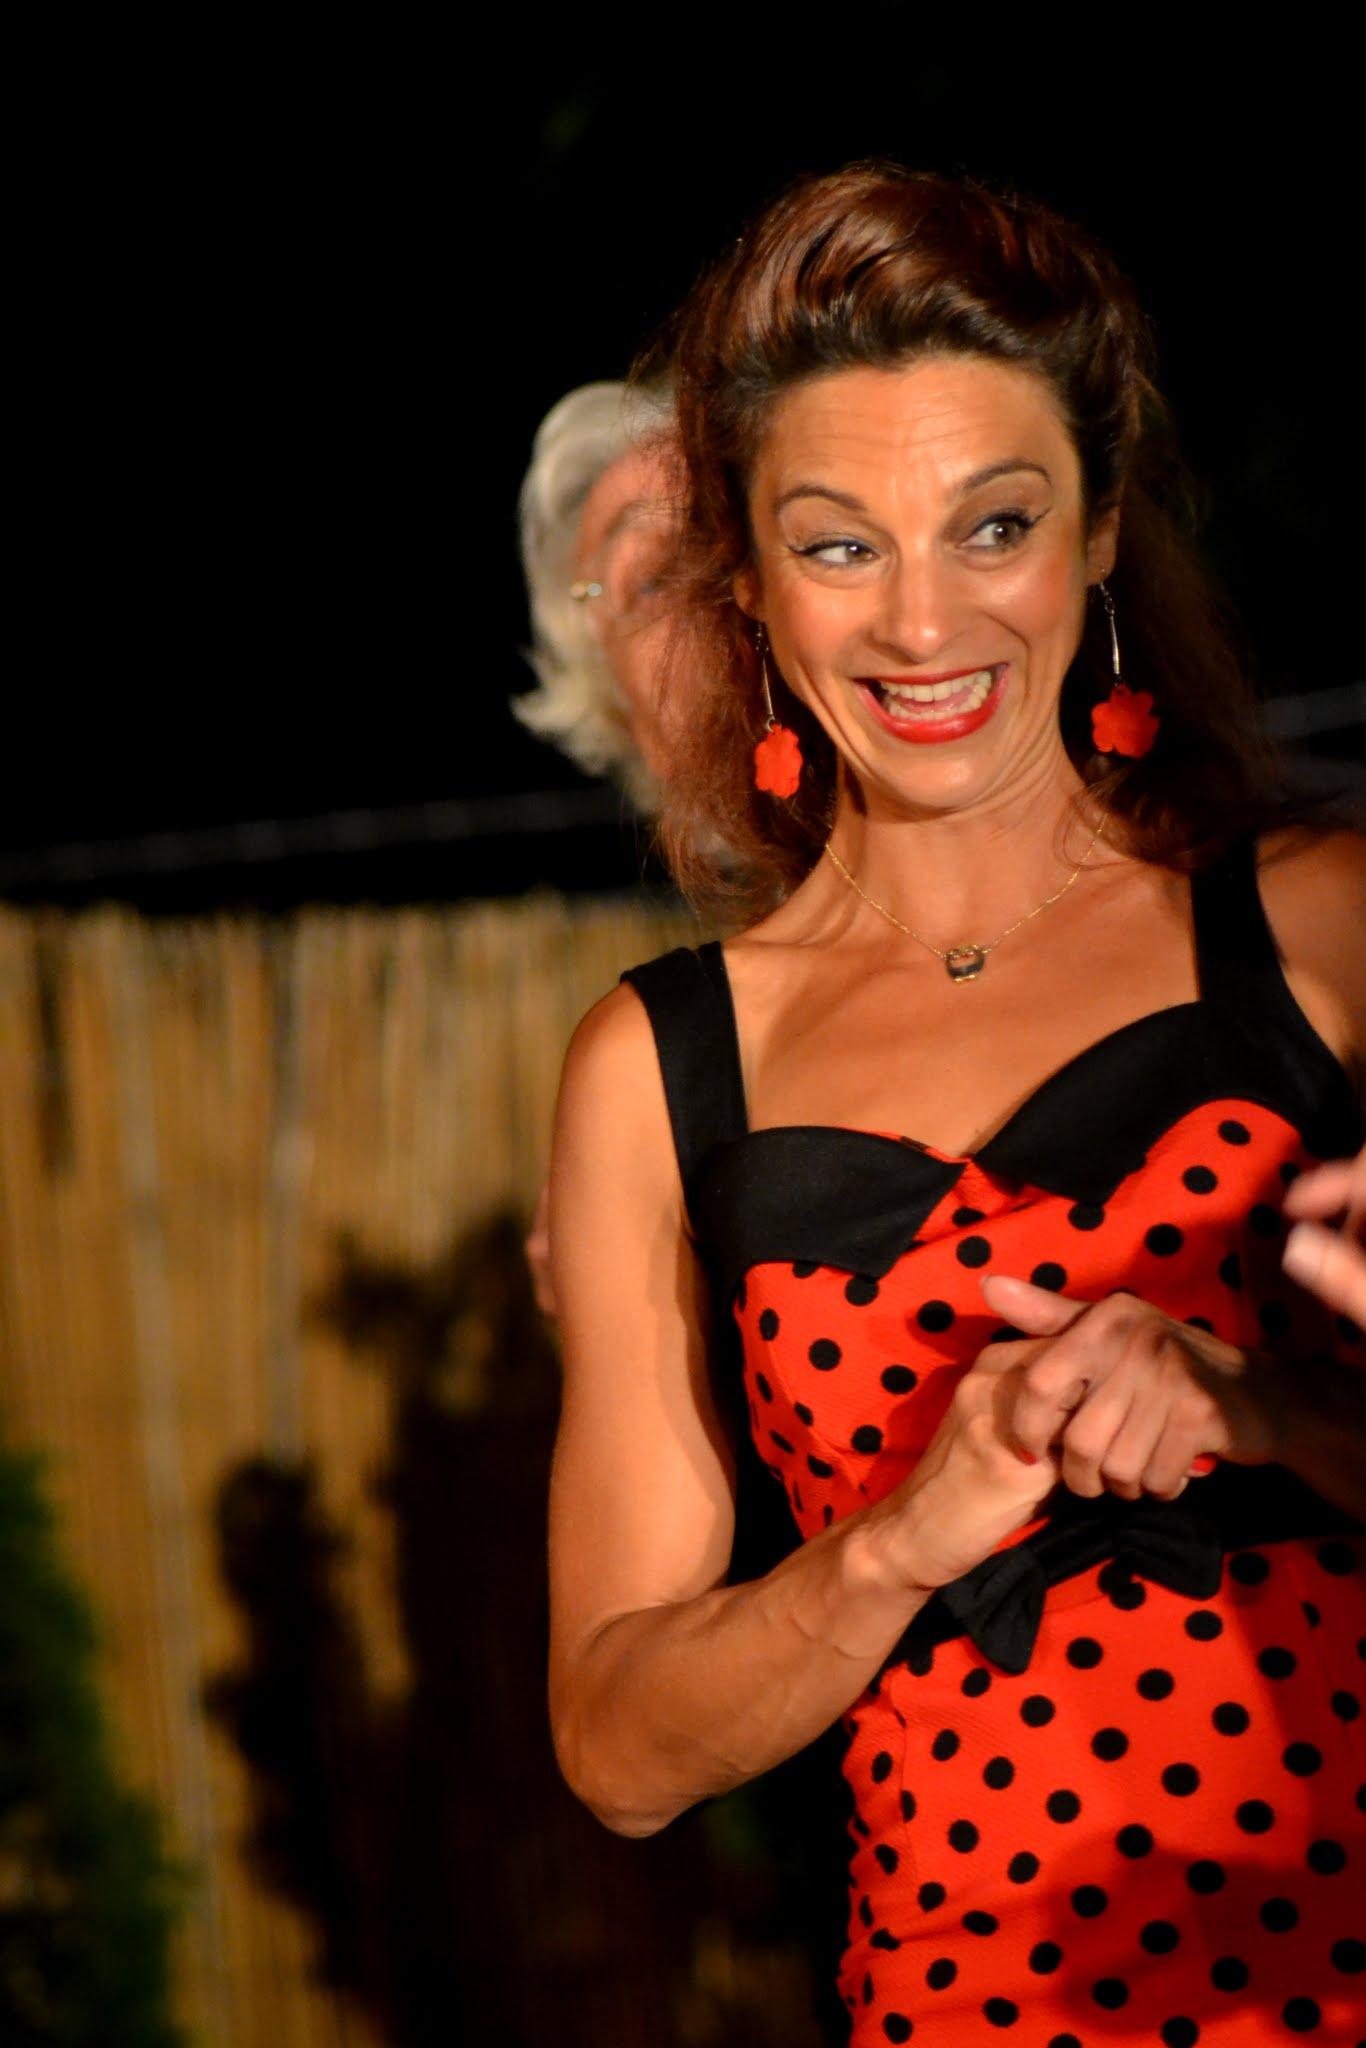 FCVT-2017-Marion tritta-Dame de chez Maxim (75)